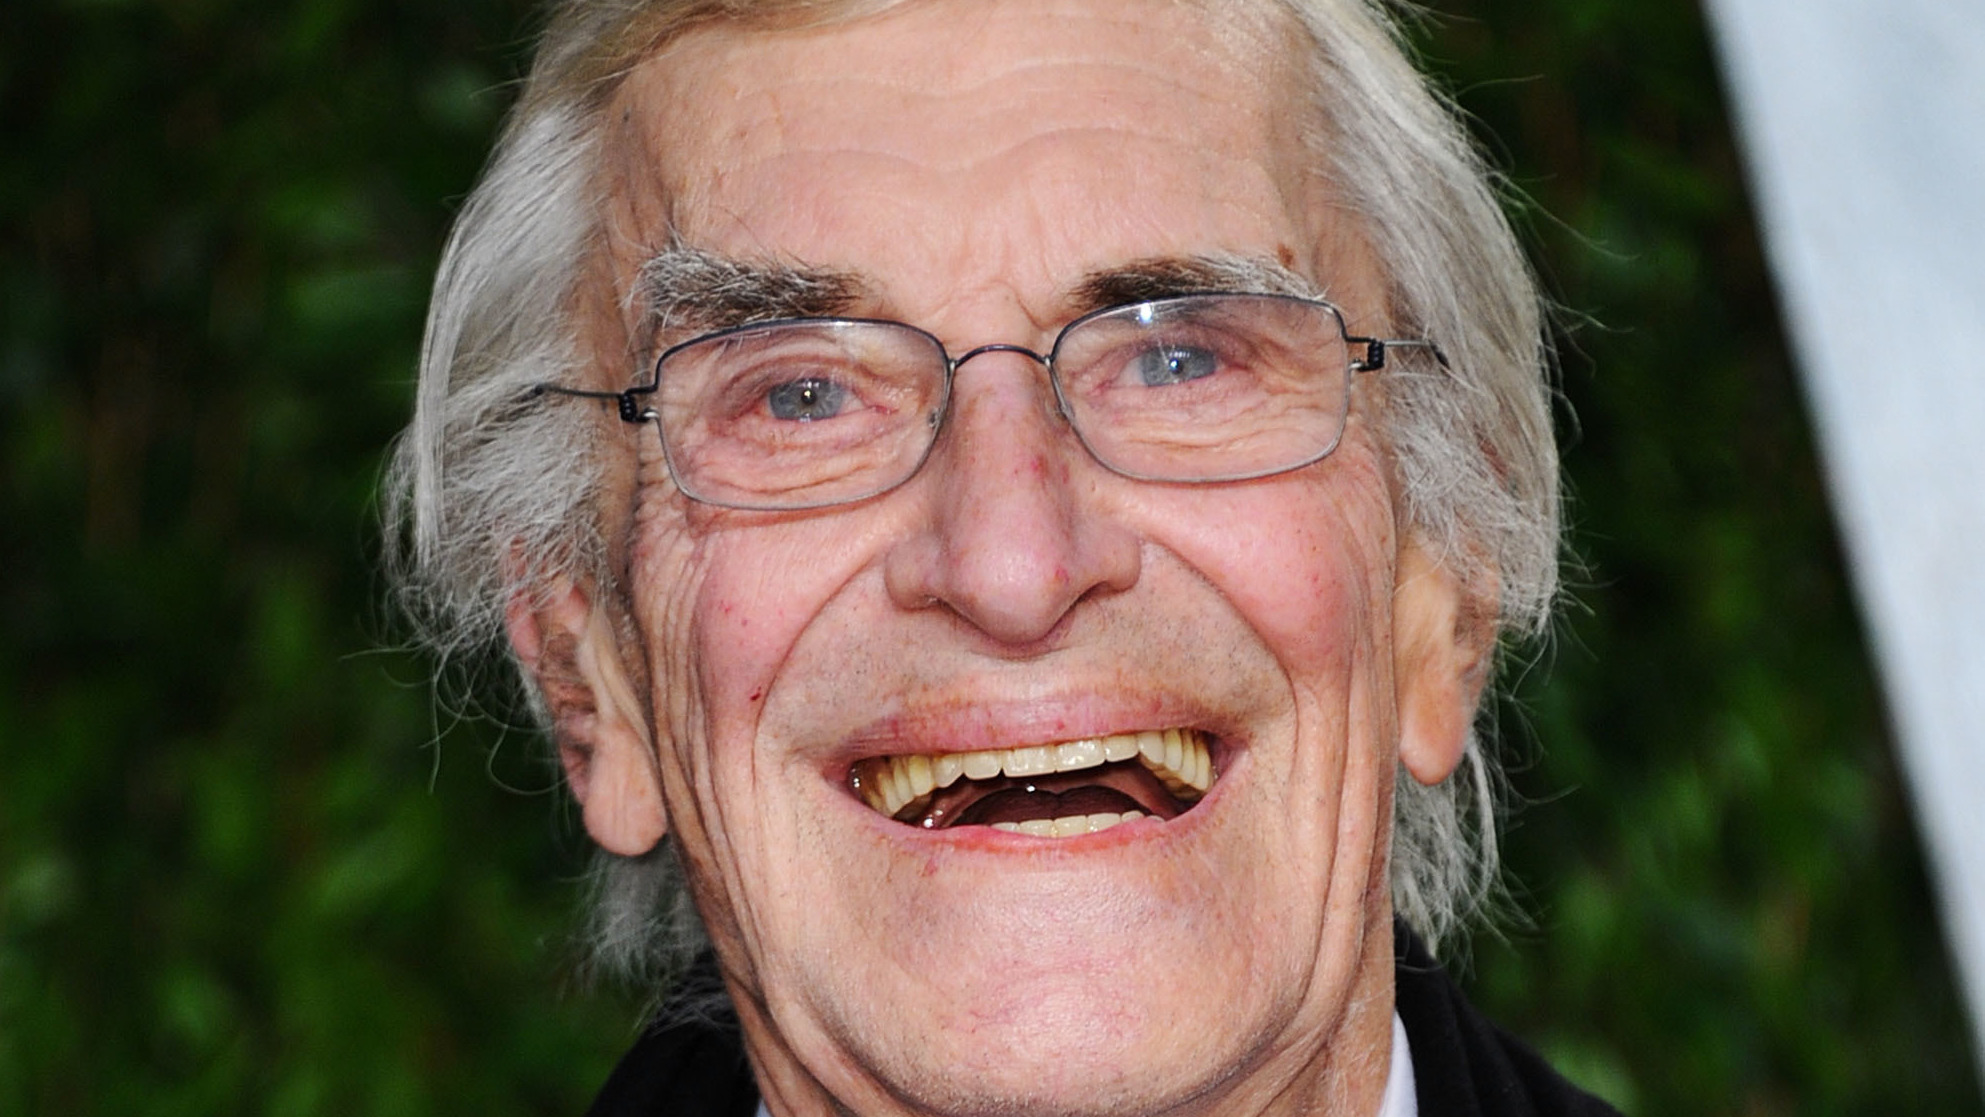 Veteran actor Martin Landau dead at 89